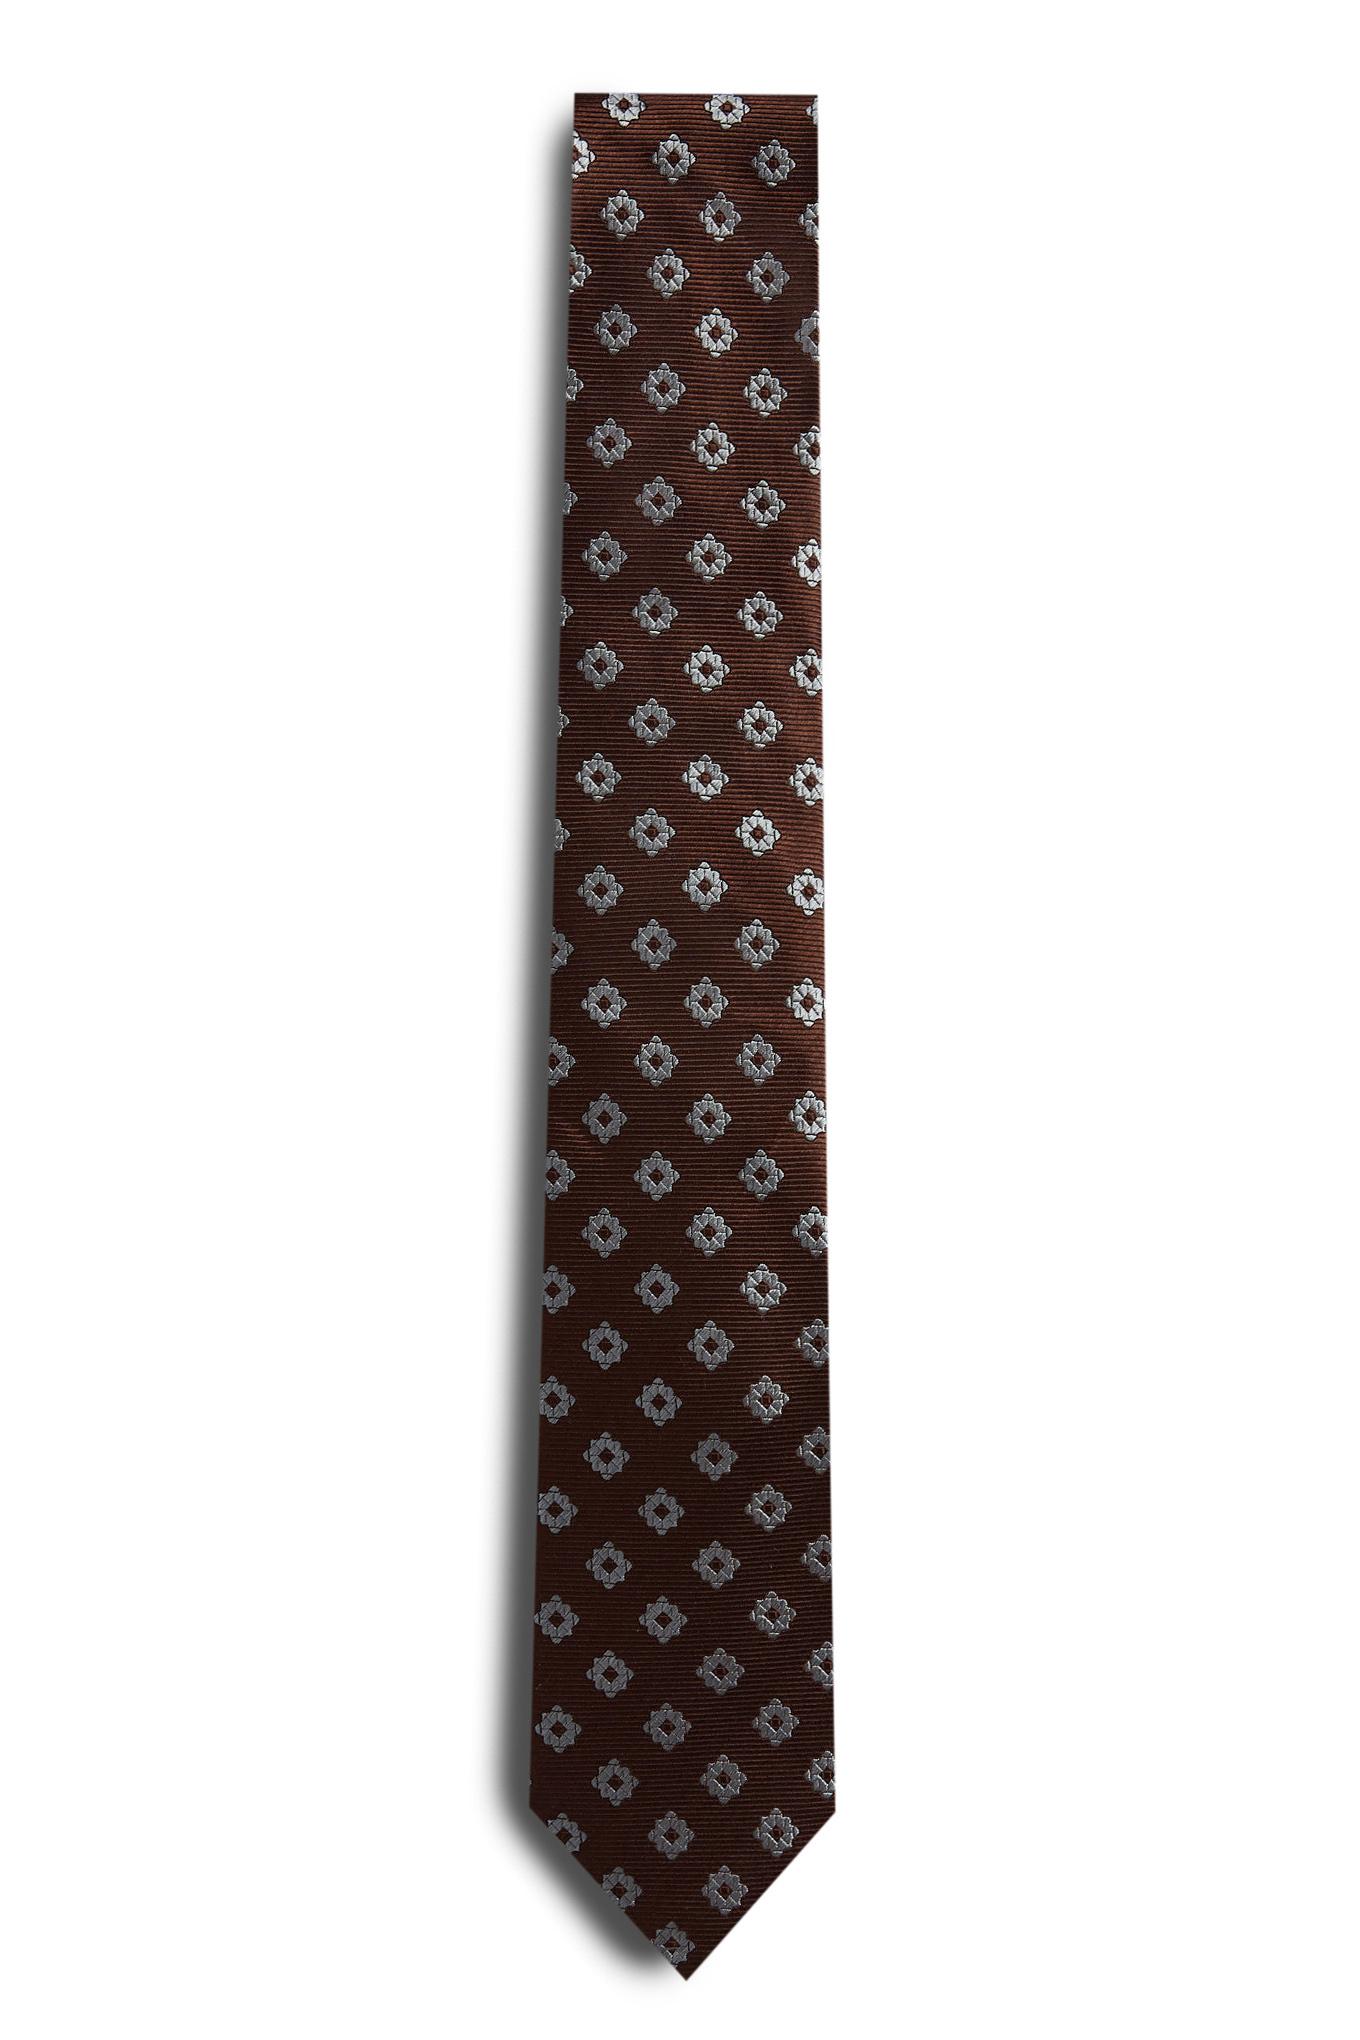 Tie Chocolate Formal Man